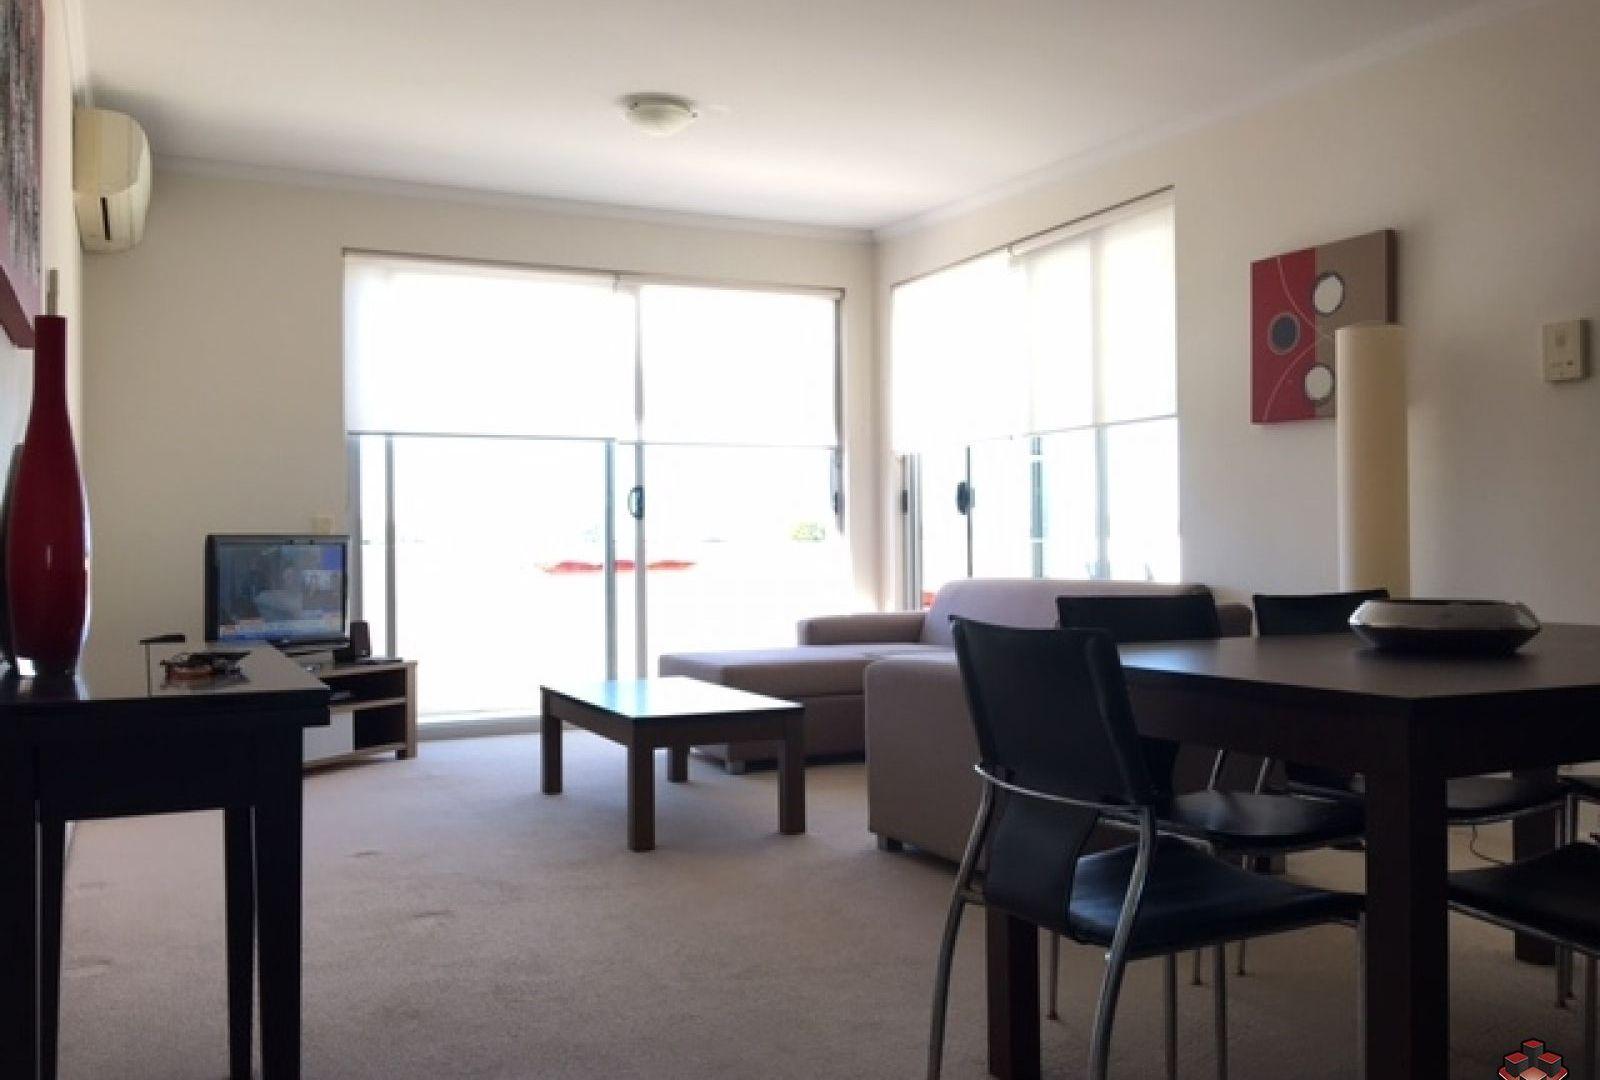 59 Keating Street, Indooroopilly QLD 4068, Image 1